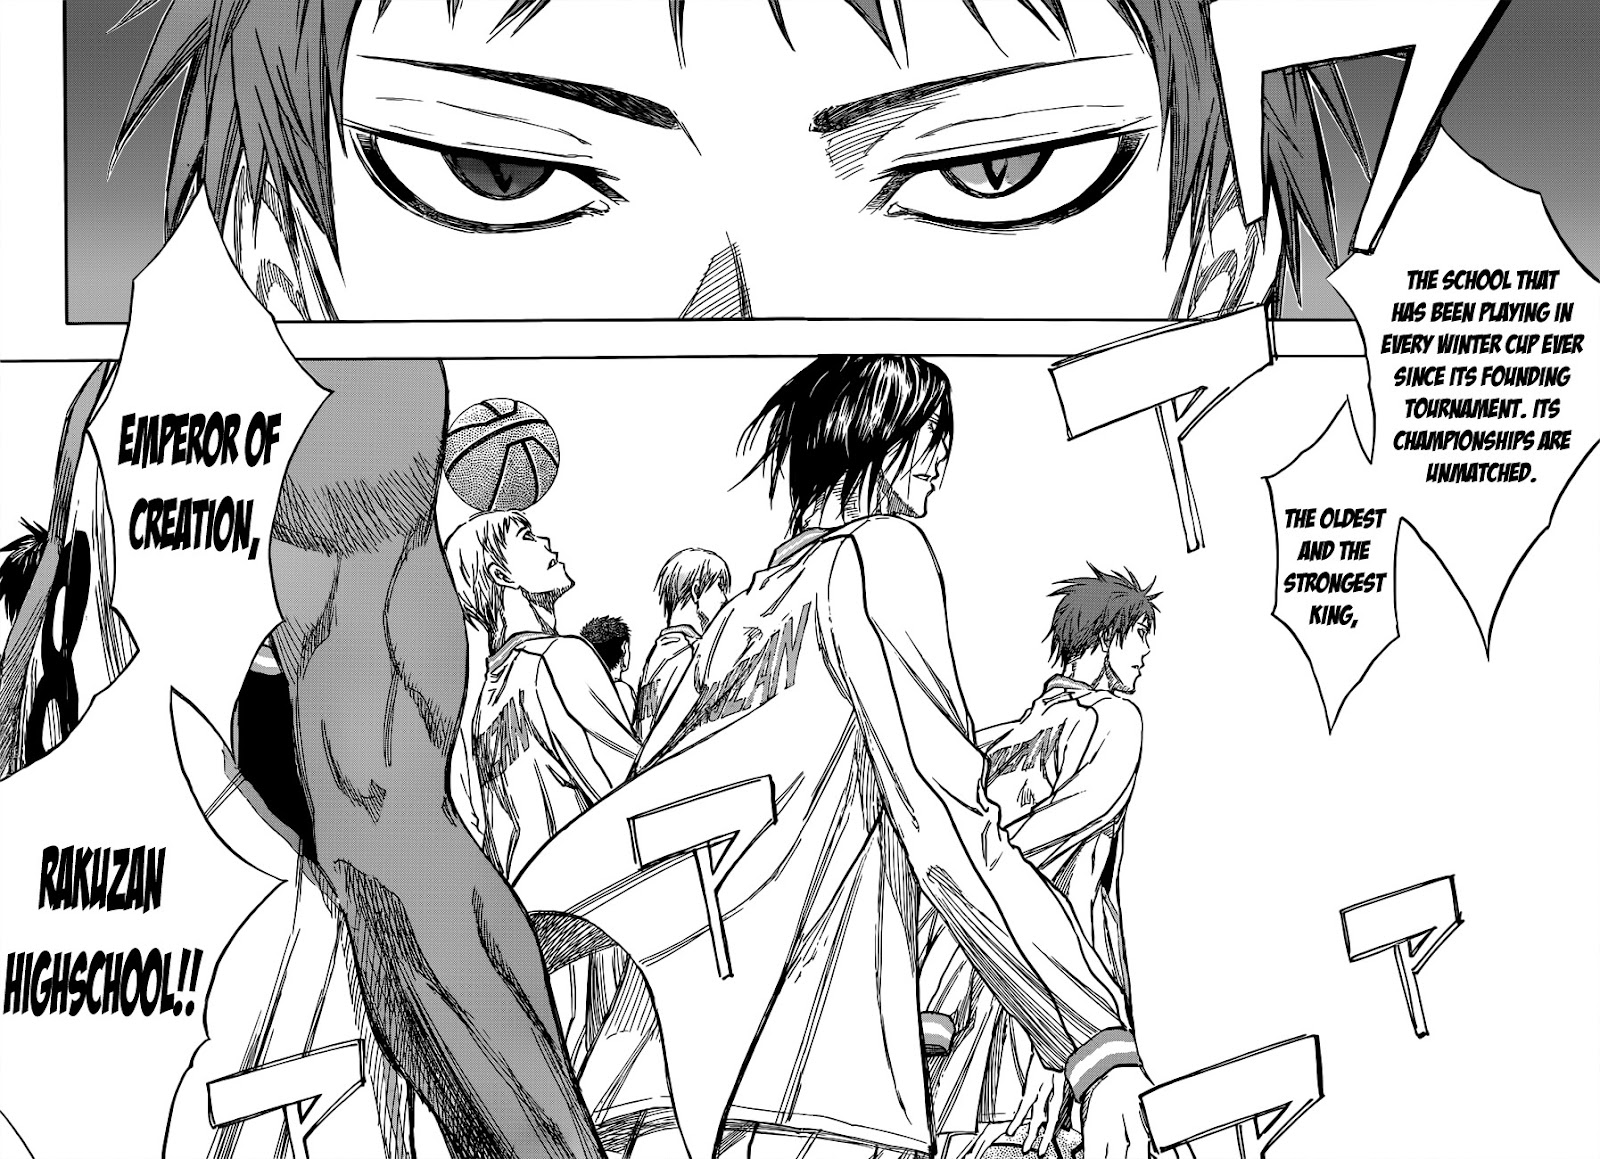 Kuroko no Basket Manga Chapter 175 - Image 06-07